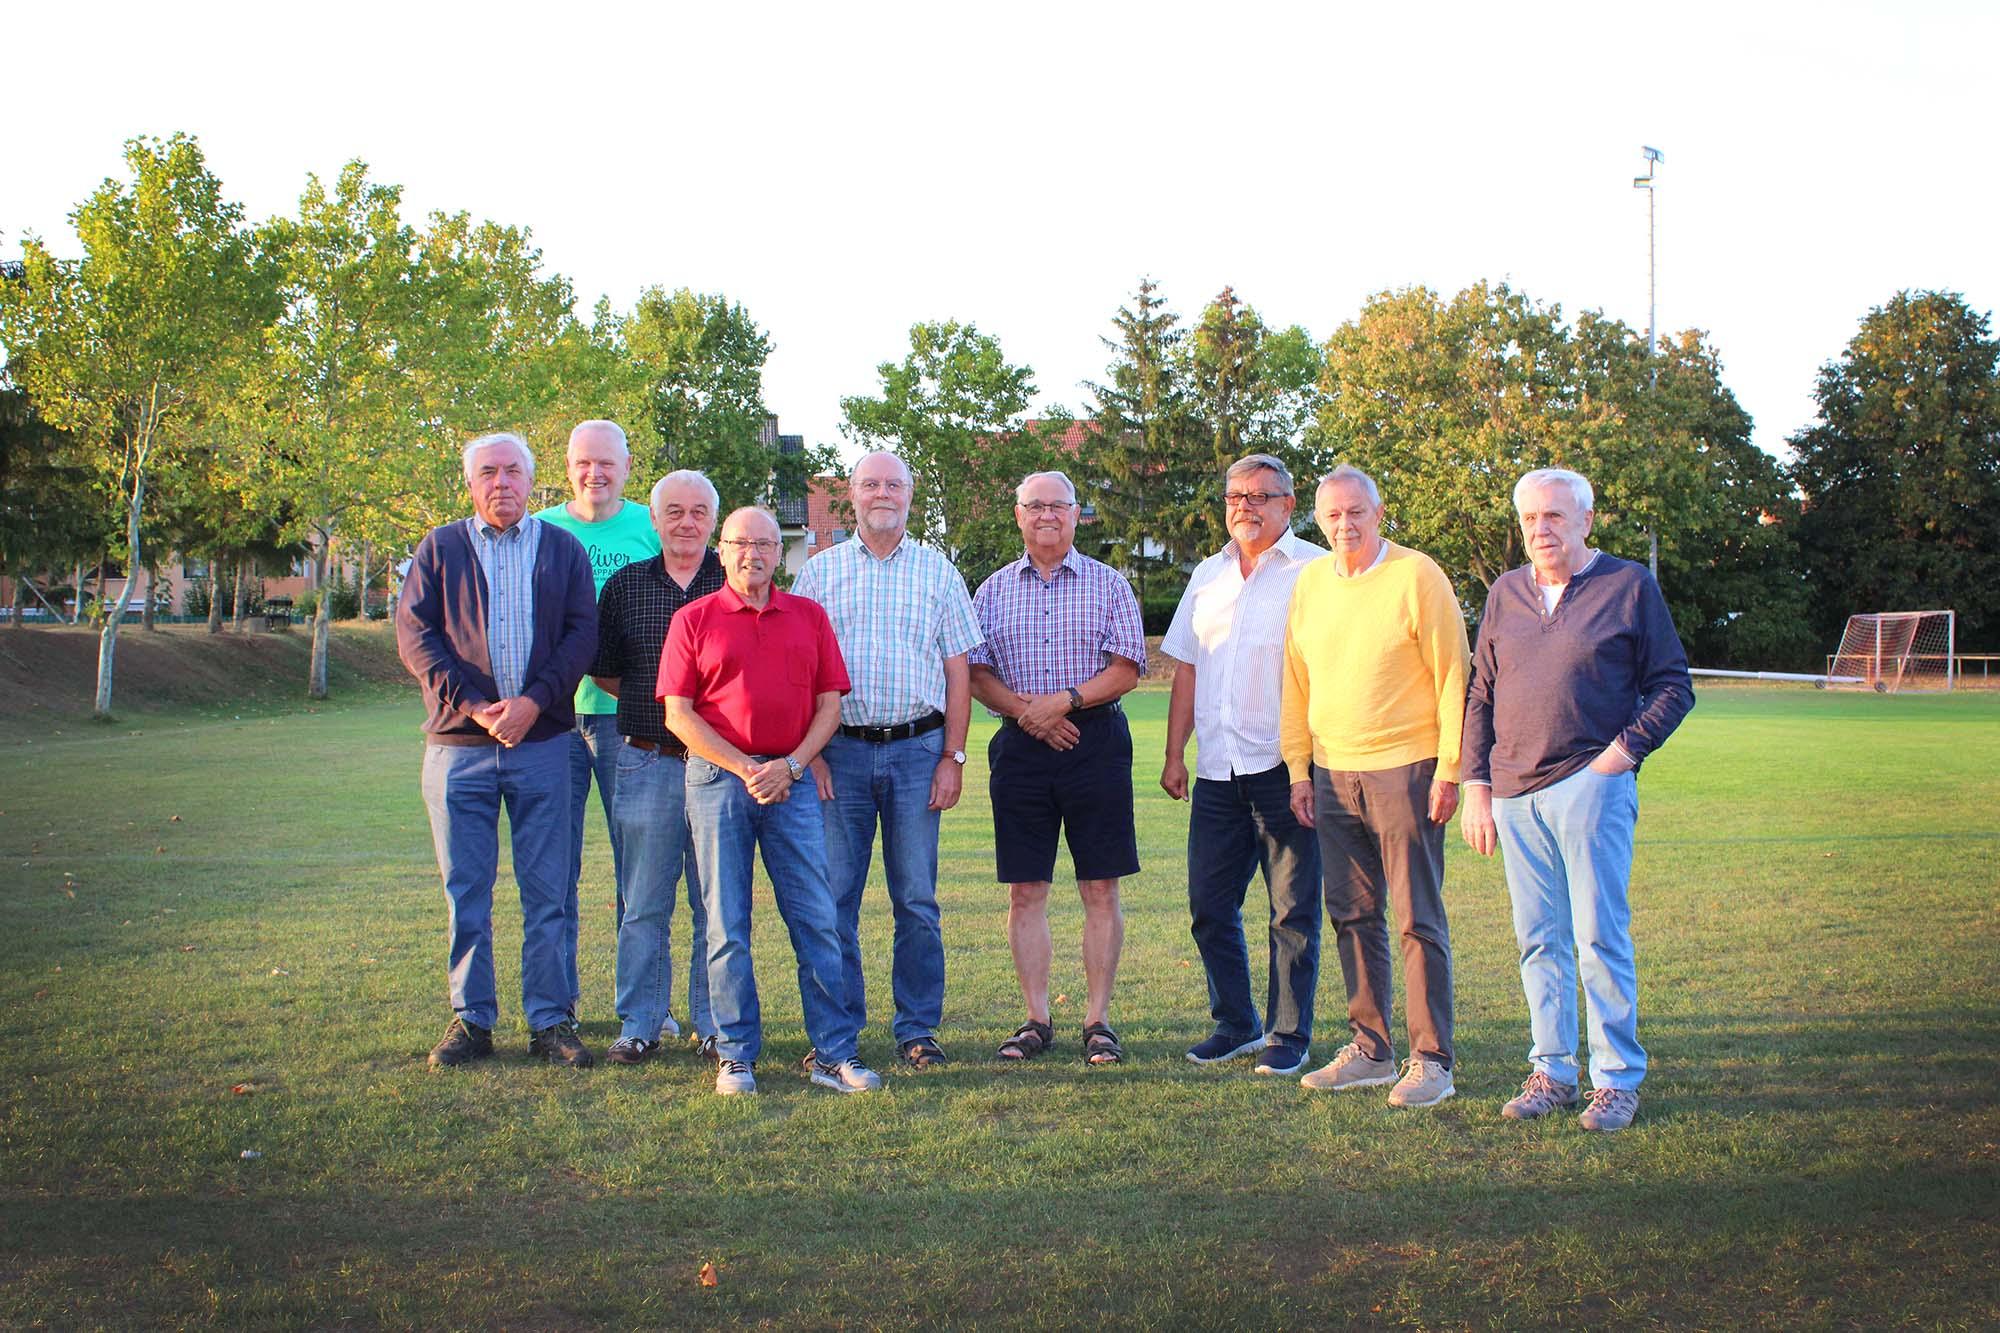 Oldies TuS Hochheim Worms, Ulrich Almeling, Karl-Dieter Jung, Rolf Löb, Josef Finger, Willi Hellwig, Bernd Rauh, Ernst Gräber, Volker Radtke, Helmut Schärf (v.l.n.r.)